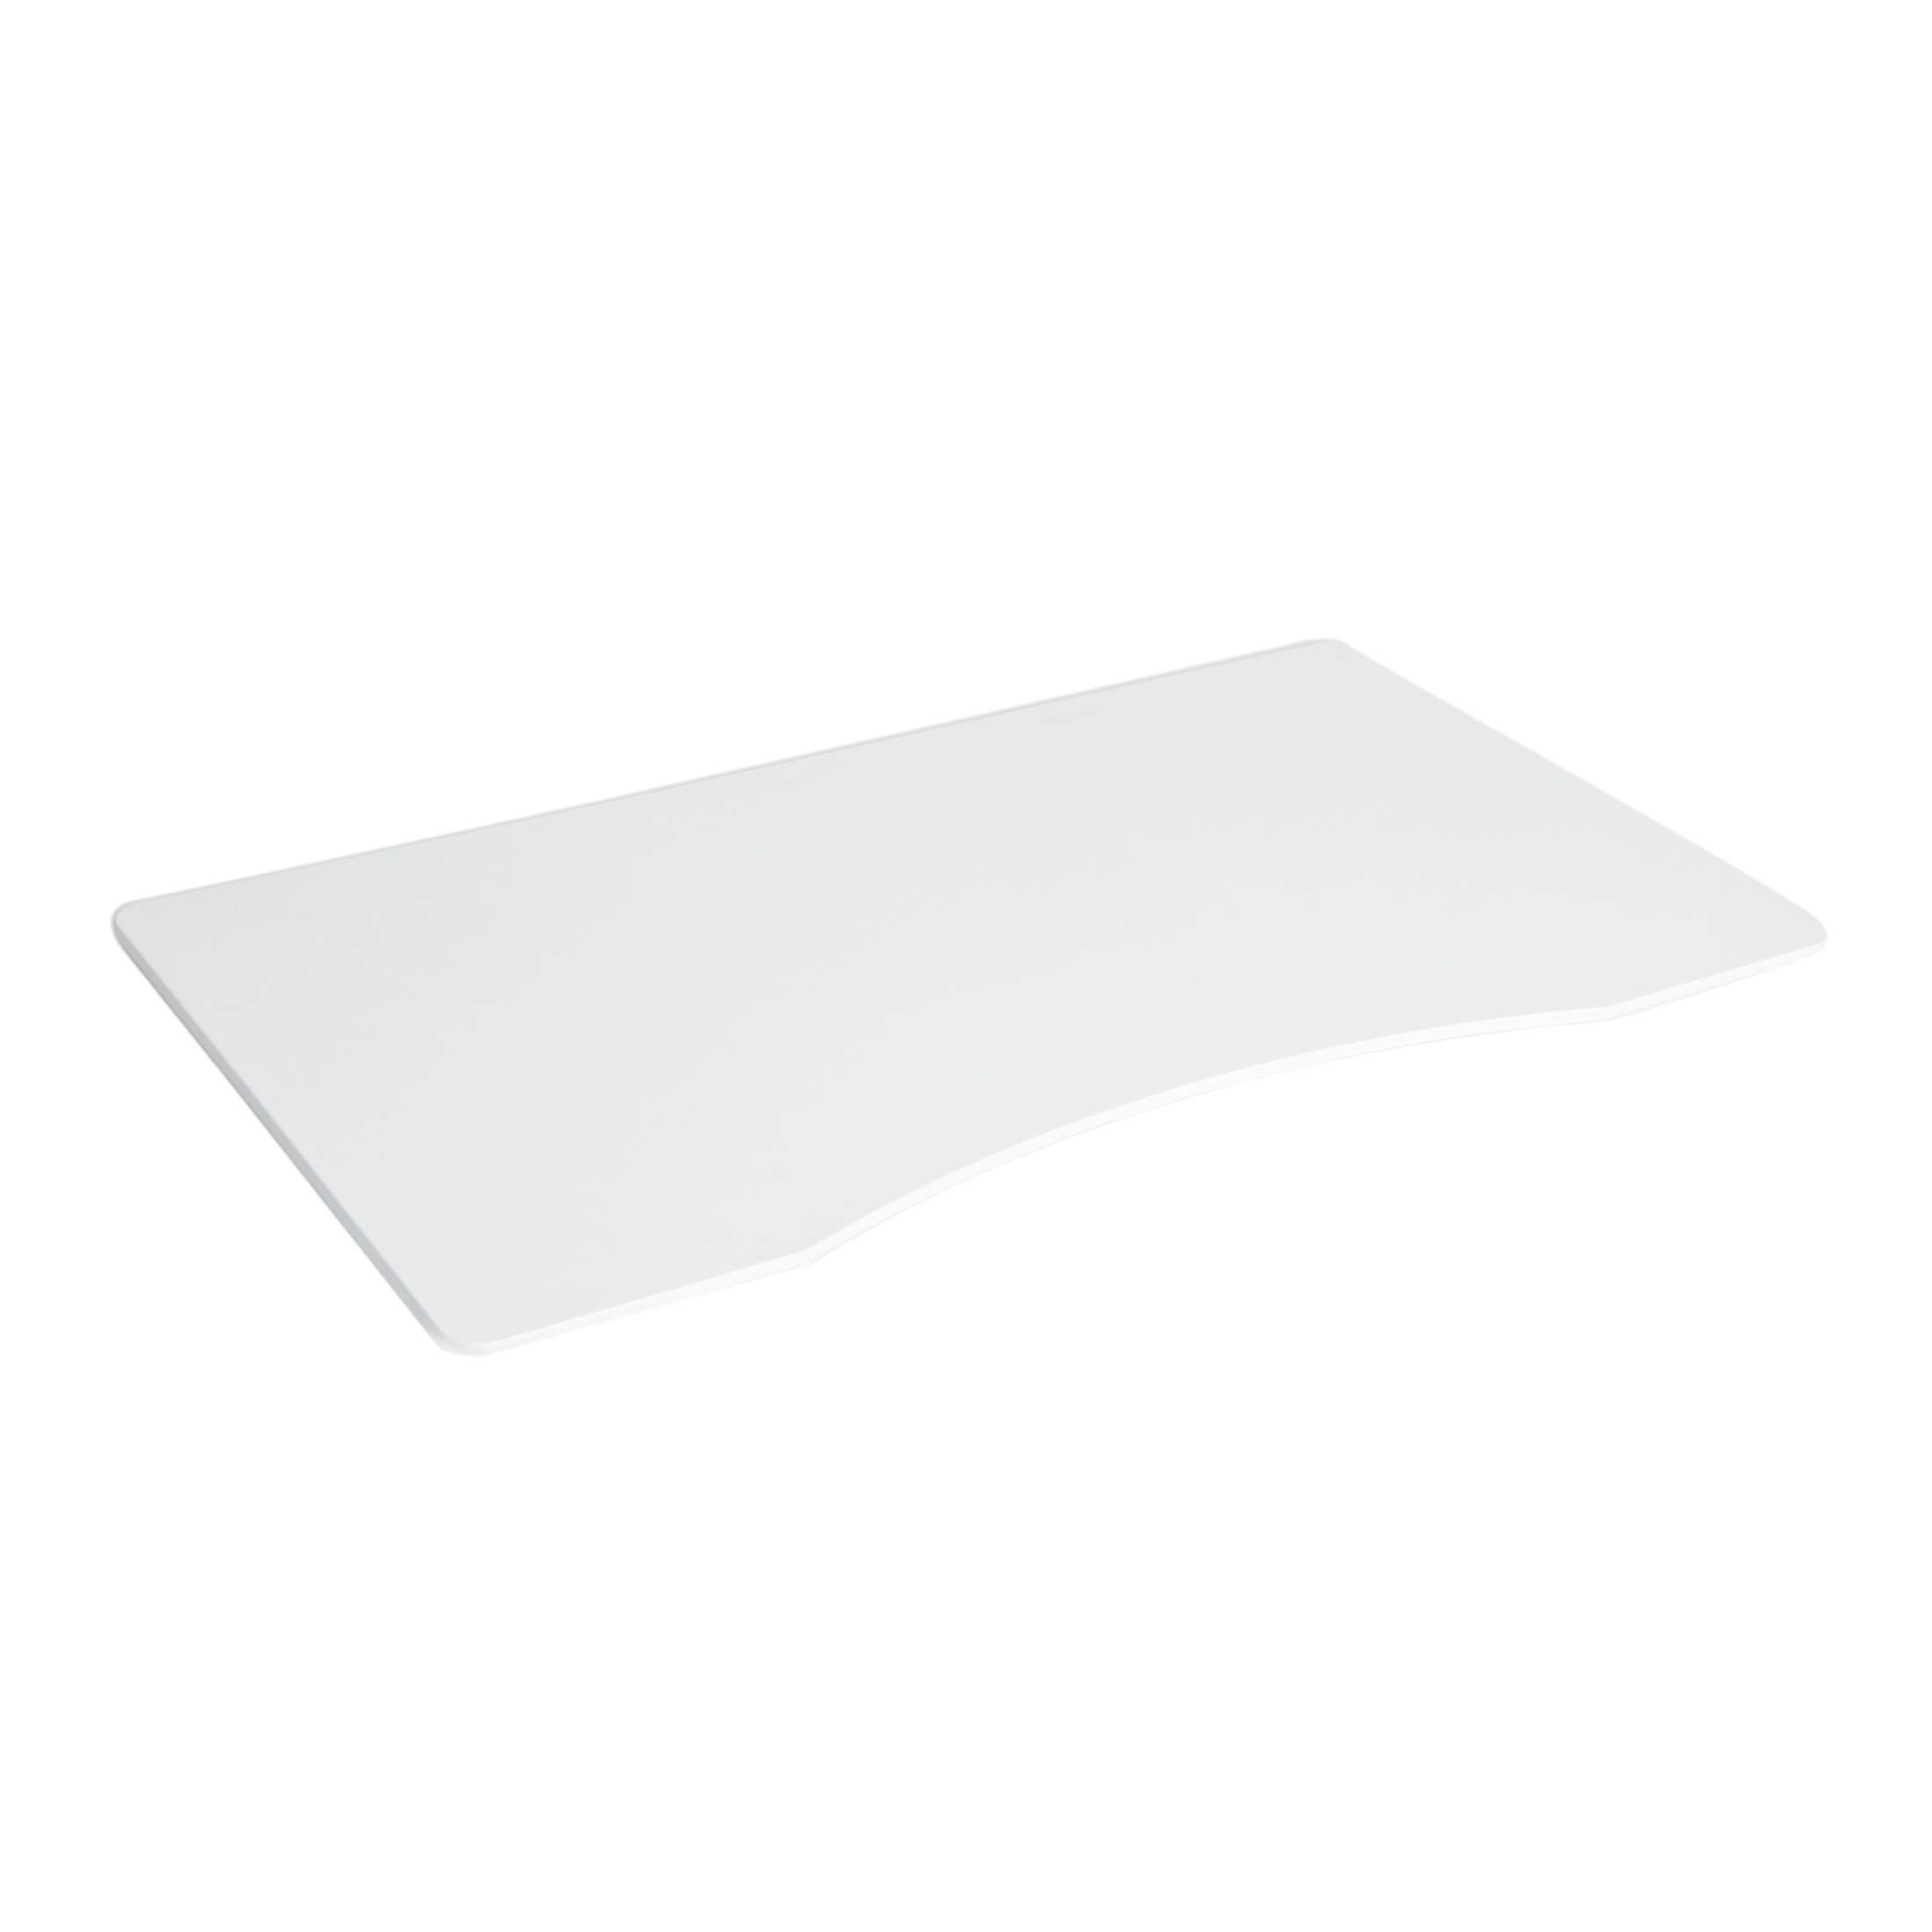 Seville Classics Ergo Desk Table Top with Beveled Bottom Edges, 54'' x 30'', White by Seville Classics